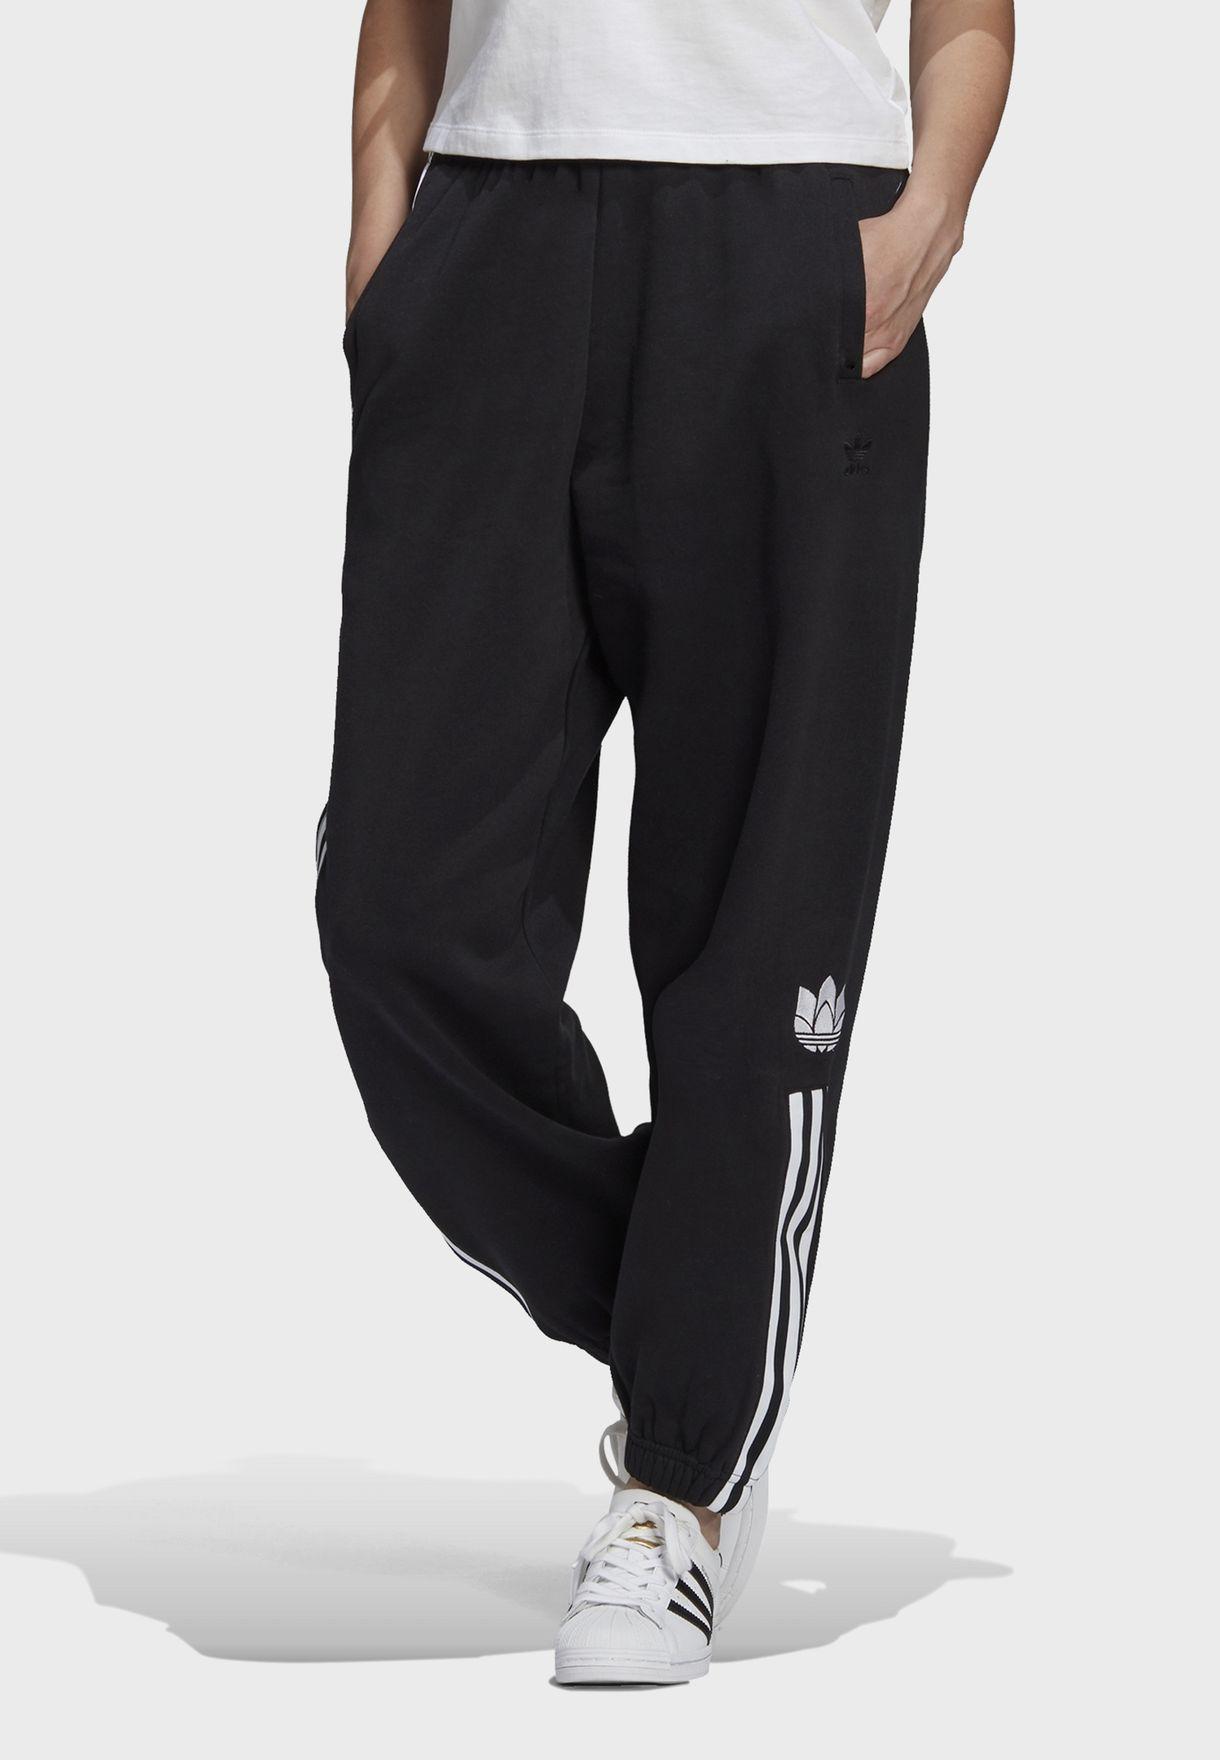 Cuffed Adicolor Casual Women's Pants